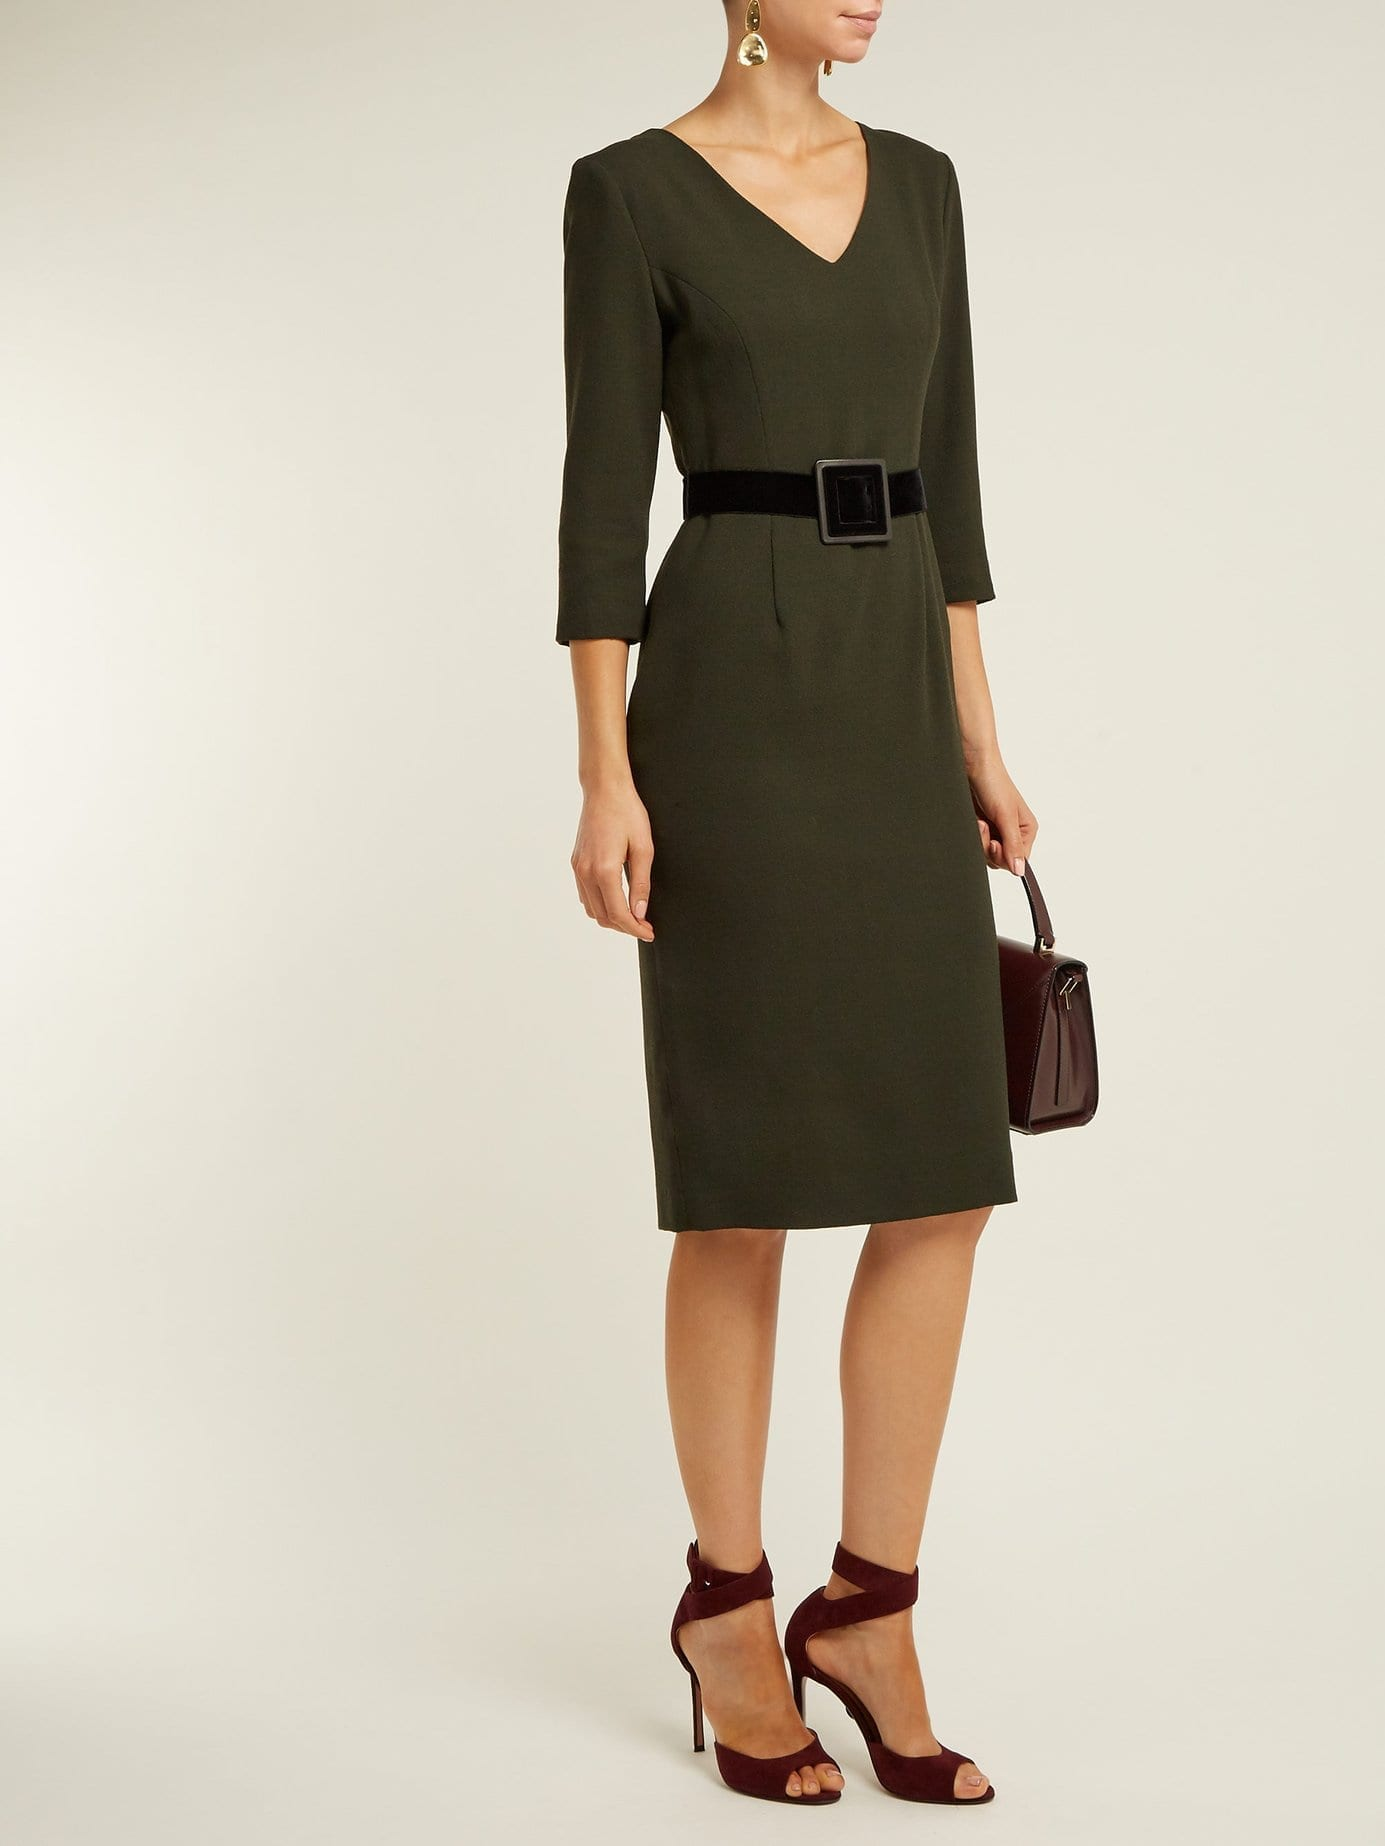 GOAT Graduate Wool-crepe Pencil Dark Green Dress